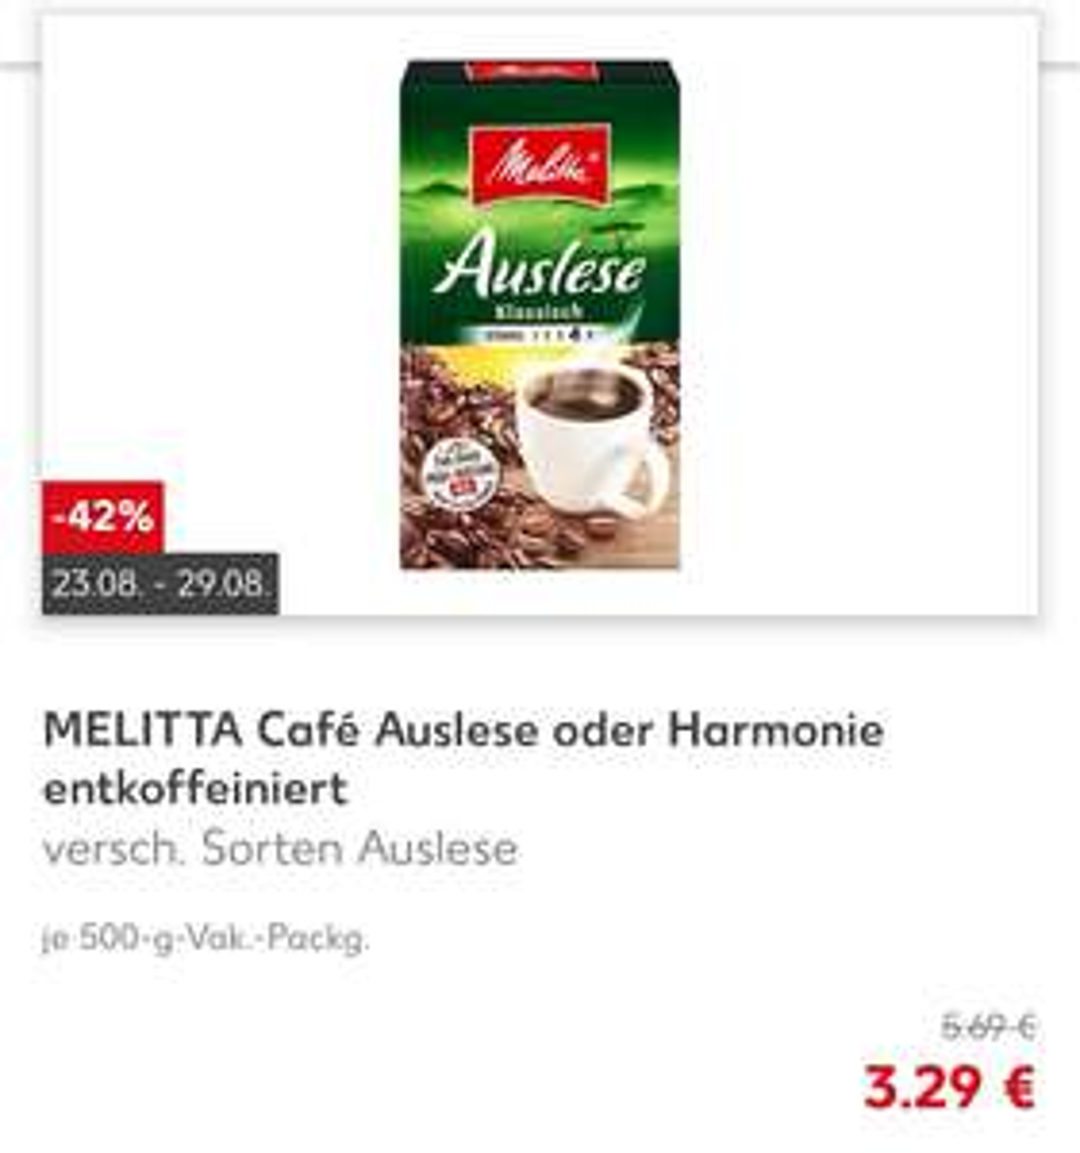 Melitta Kaffee 500g - Kaufland (National)